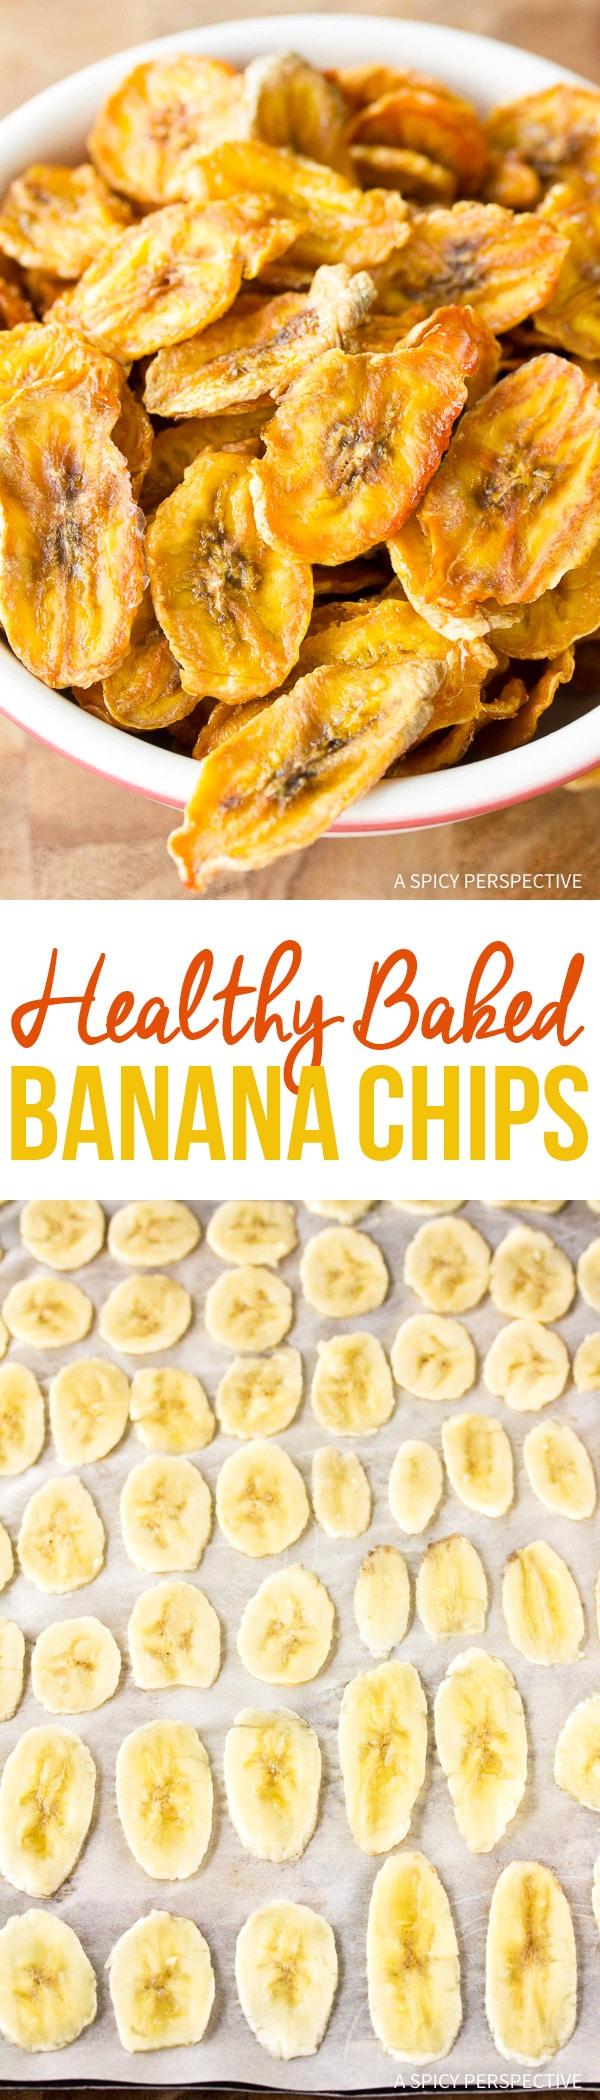 Best Healthy Baked Banana Chips Recipe